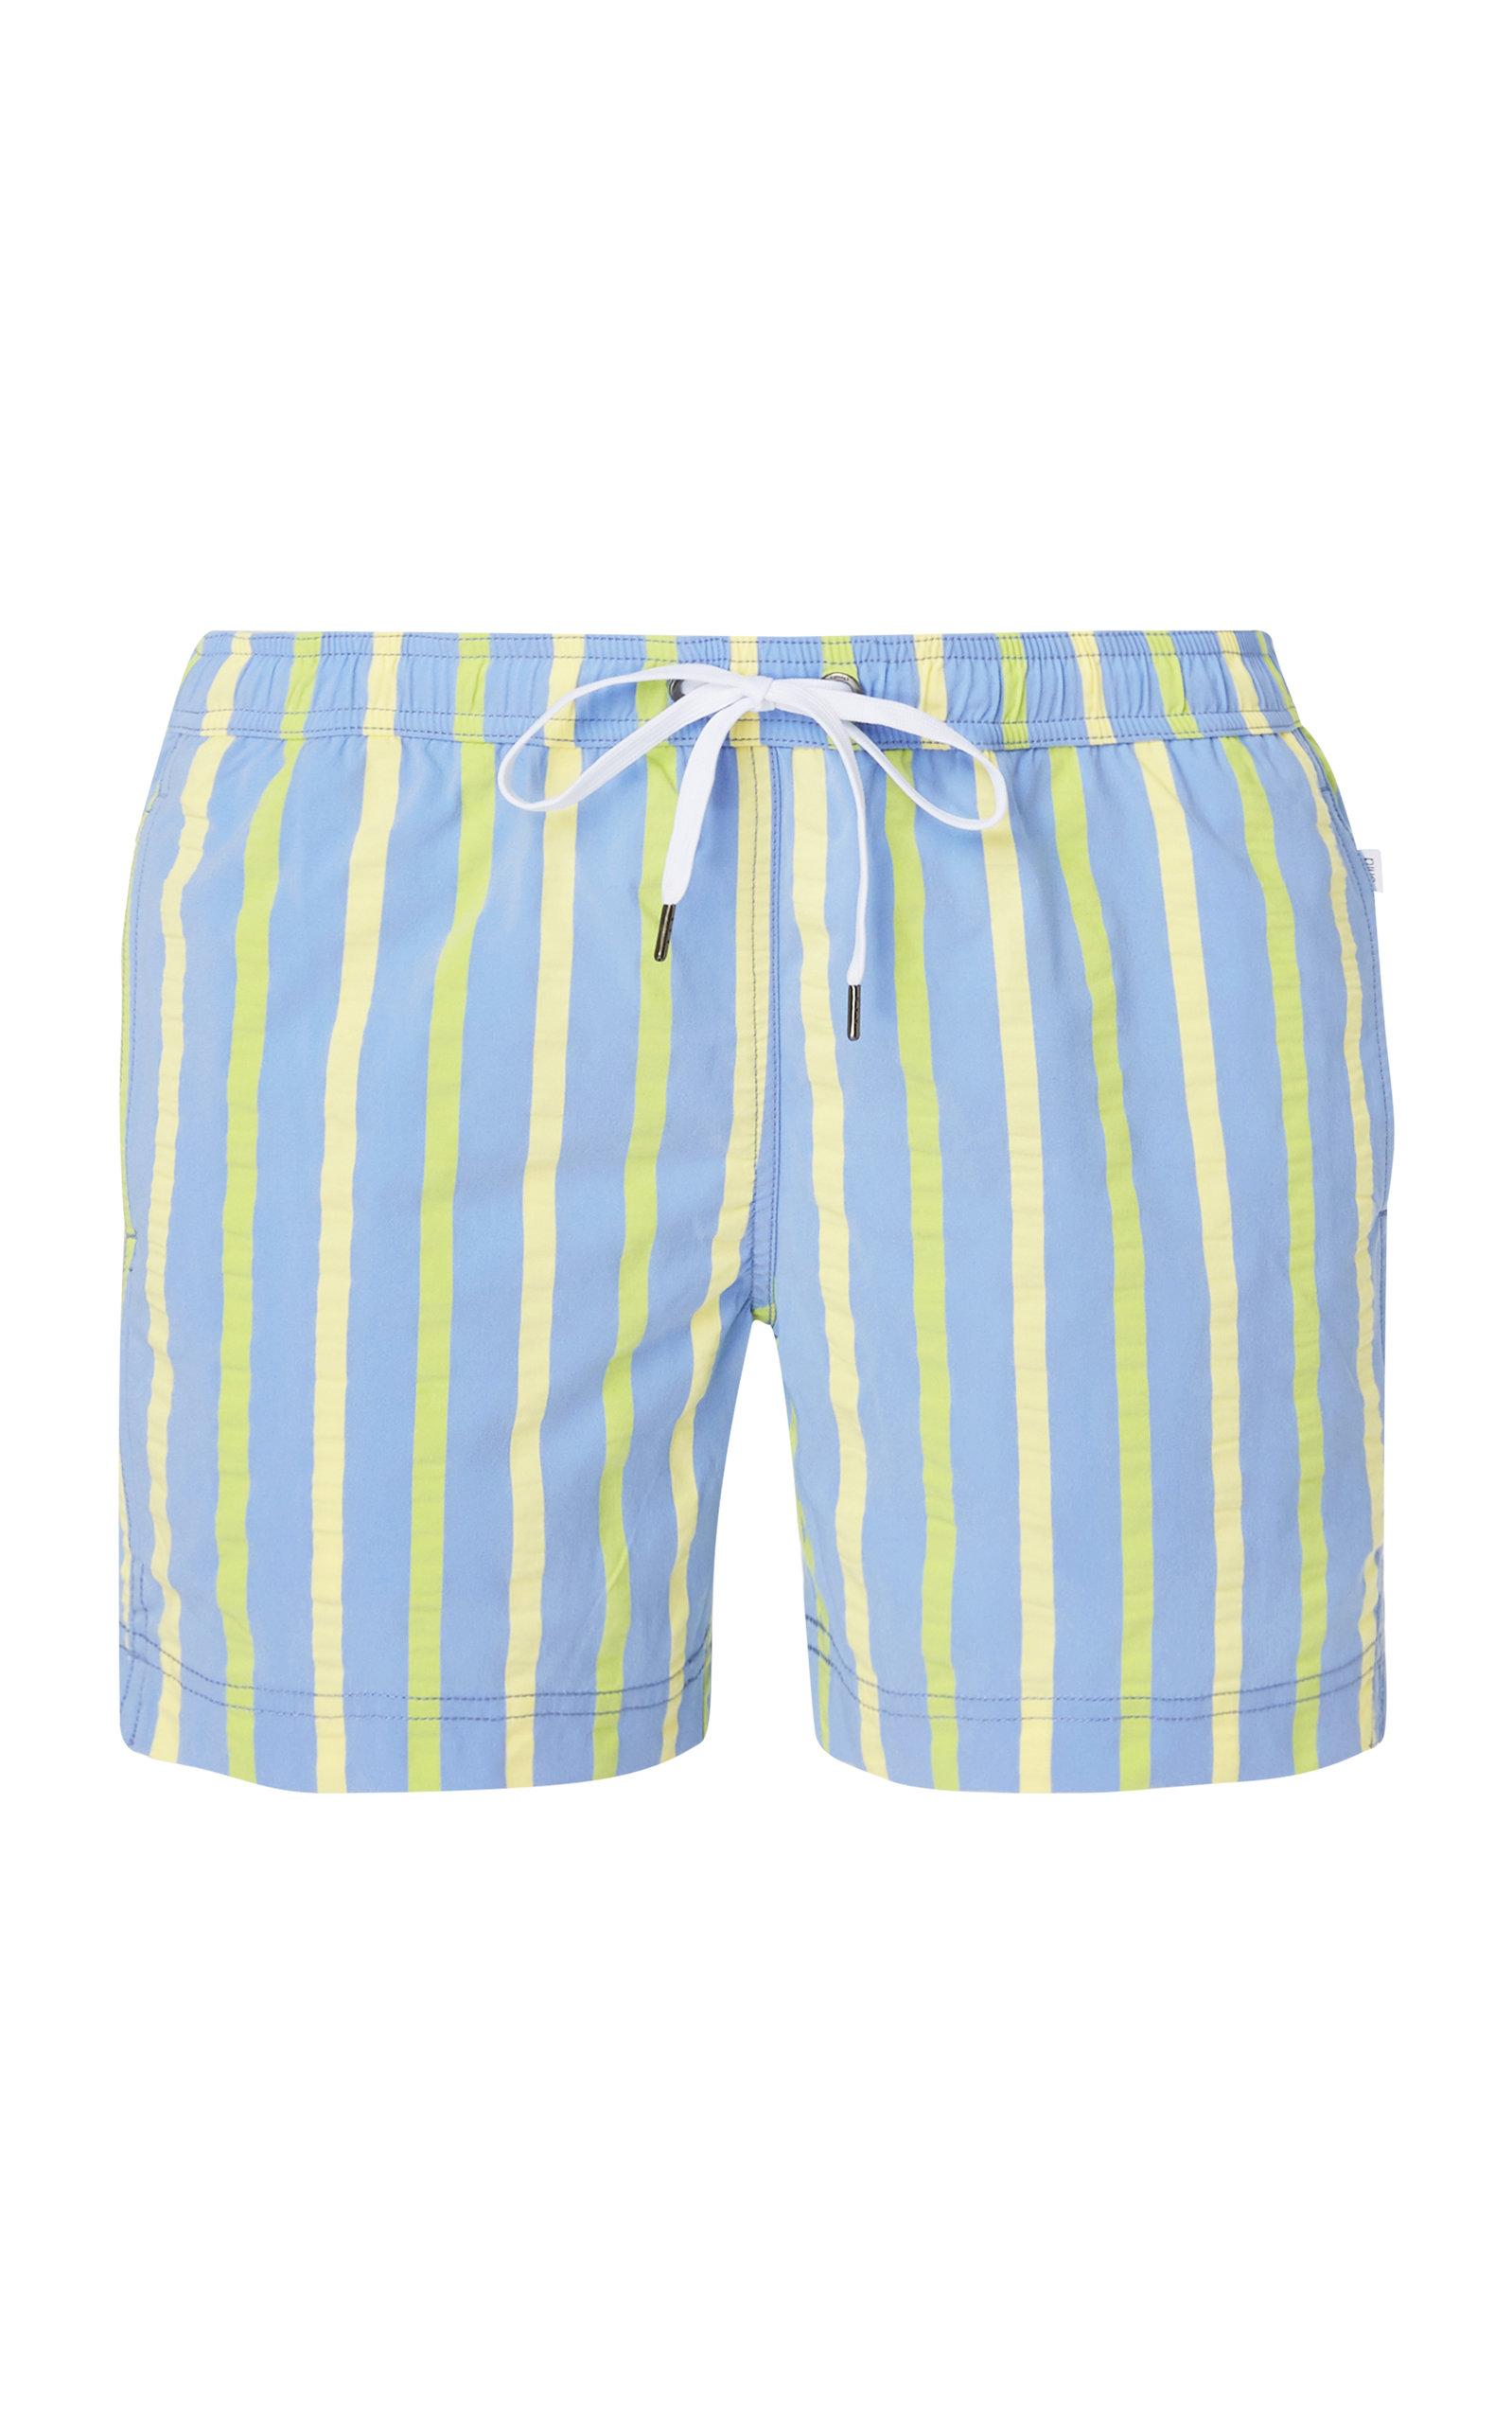 1ed1648d944ba Charles 5 Striped Swim Trunks by Onia | Moda Operandi